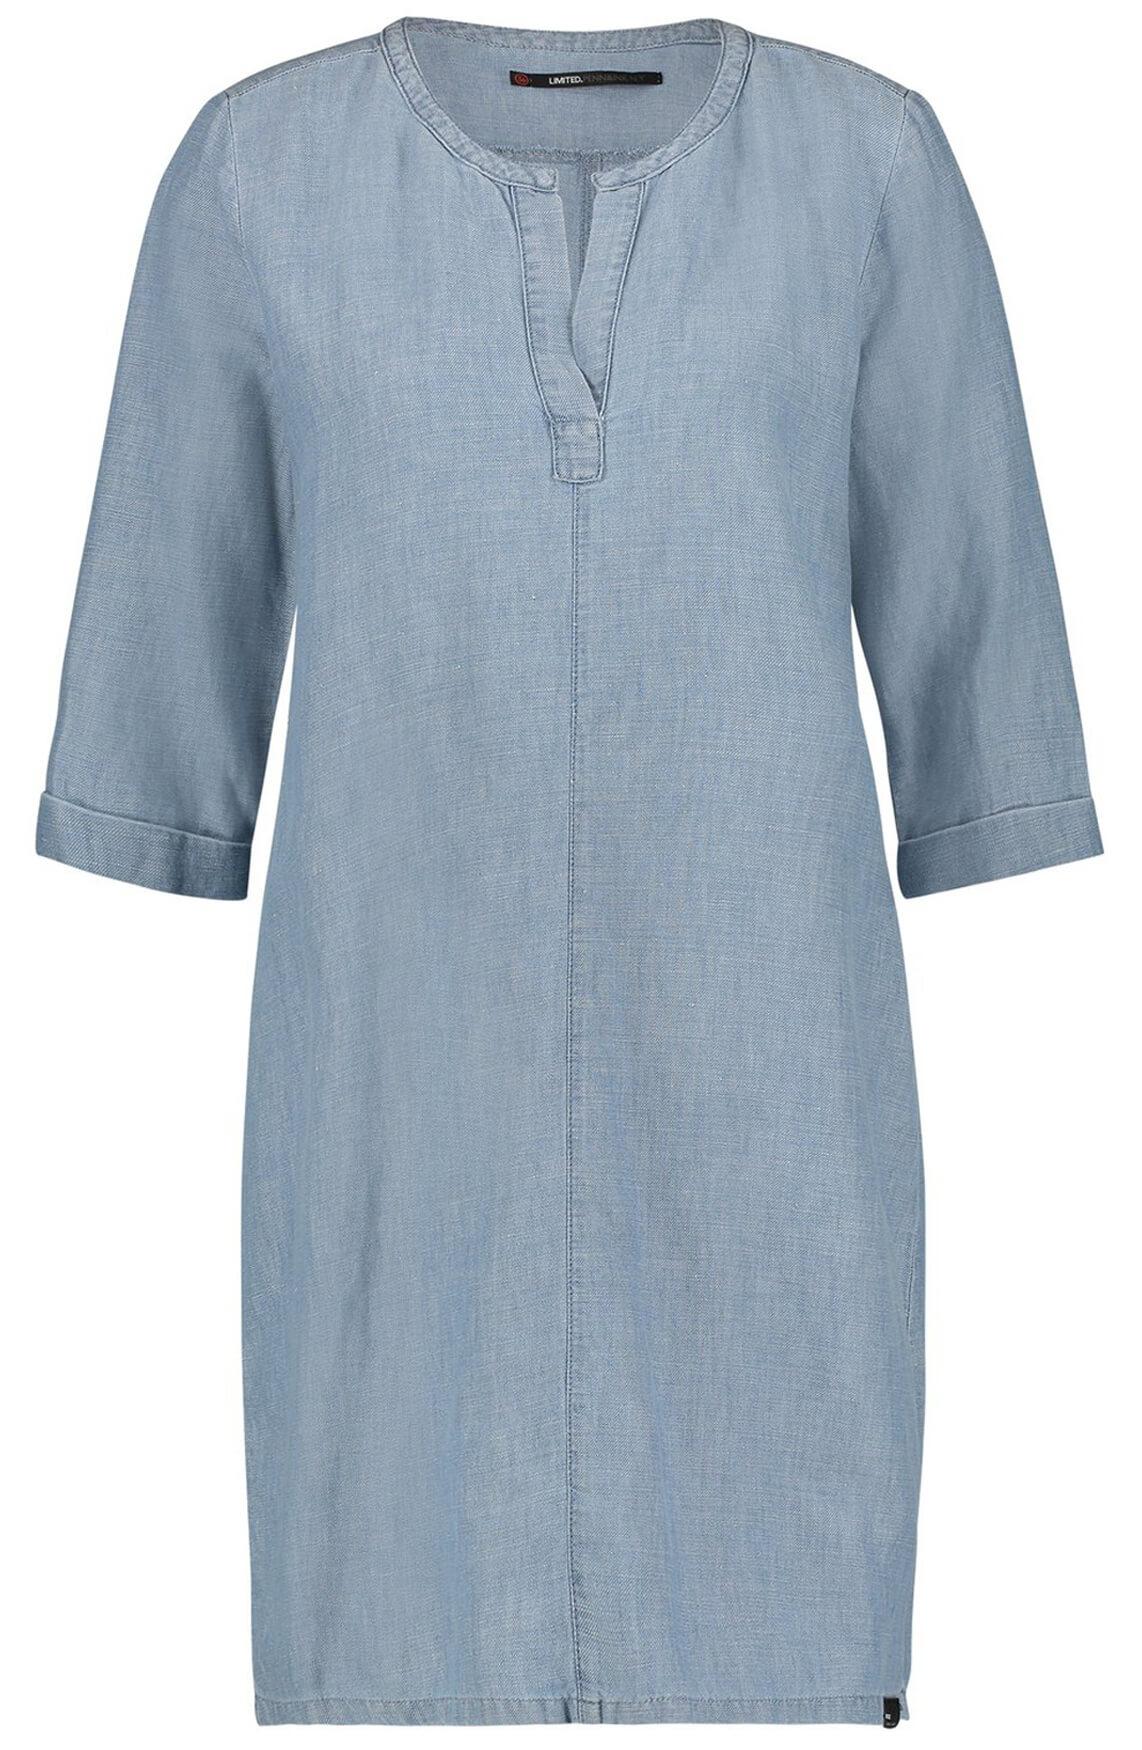 Penn & Ink Dames Denim jurk met V-hals Blauw